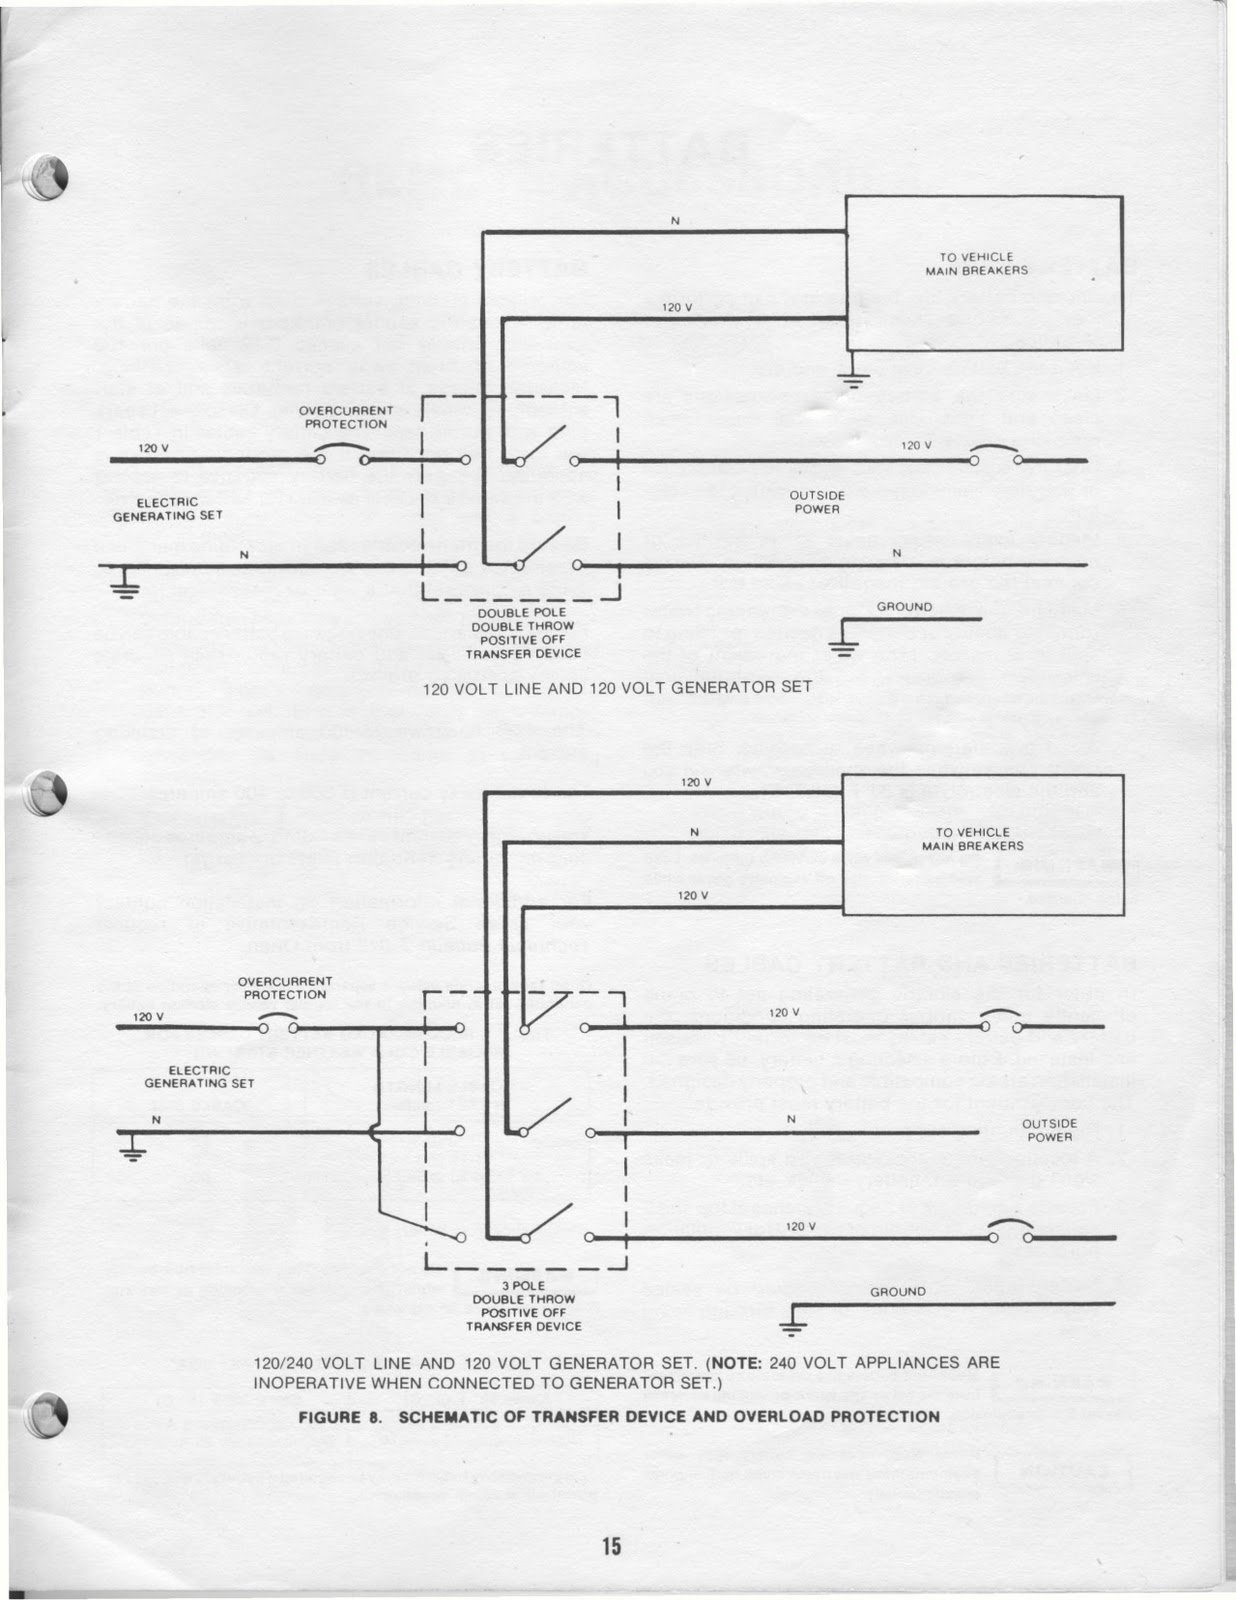 onan nh manual onan manual genuine onan n ignition coil kit includes coil bracket misc hardware etc replaces onan coil n bge nhe nhd bgm onan models  [ 1236 x 1600 Pixel ]